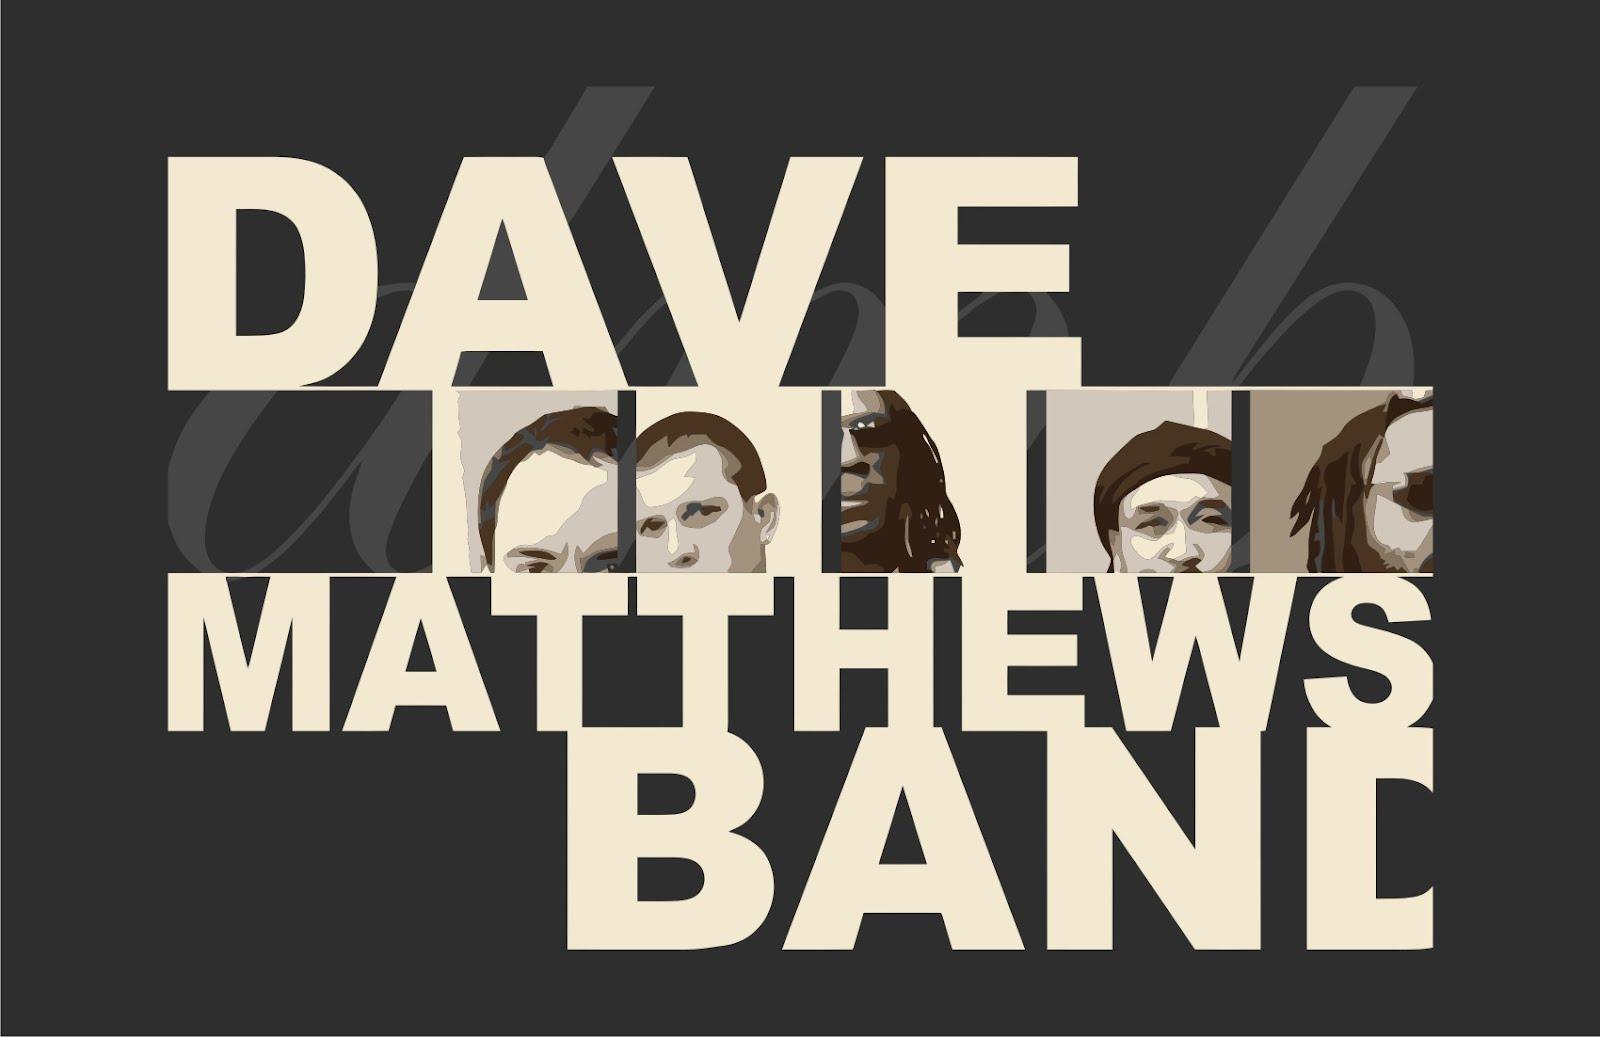 dave_matthews_band_front_vector